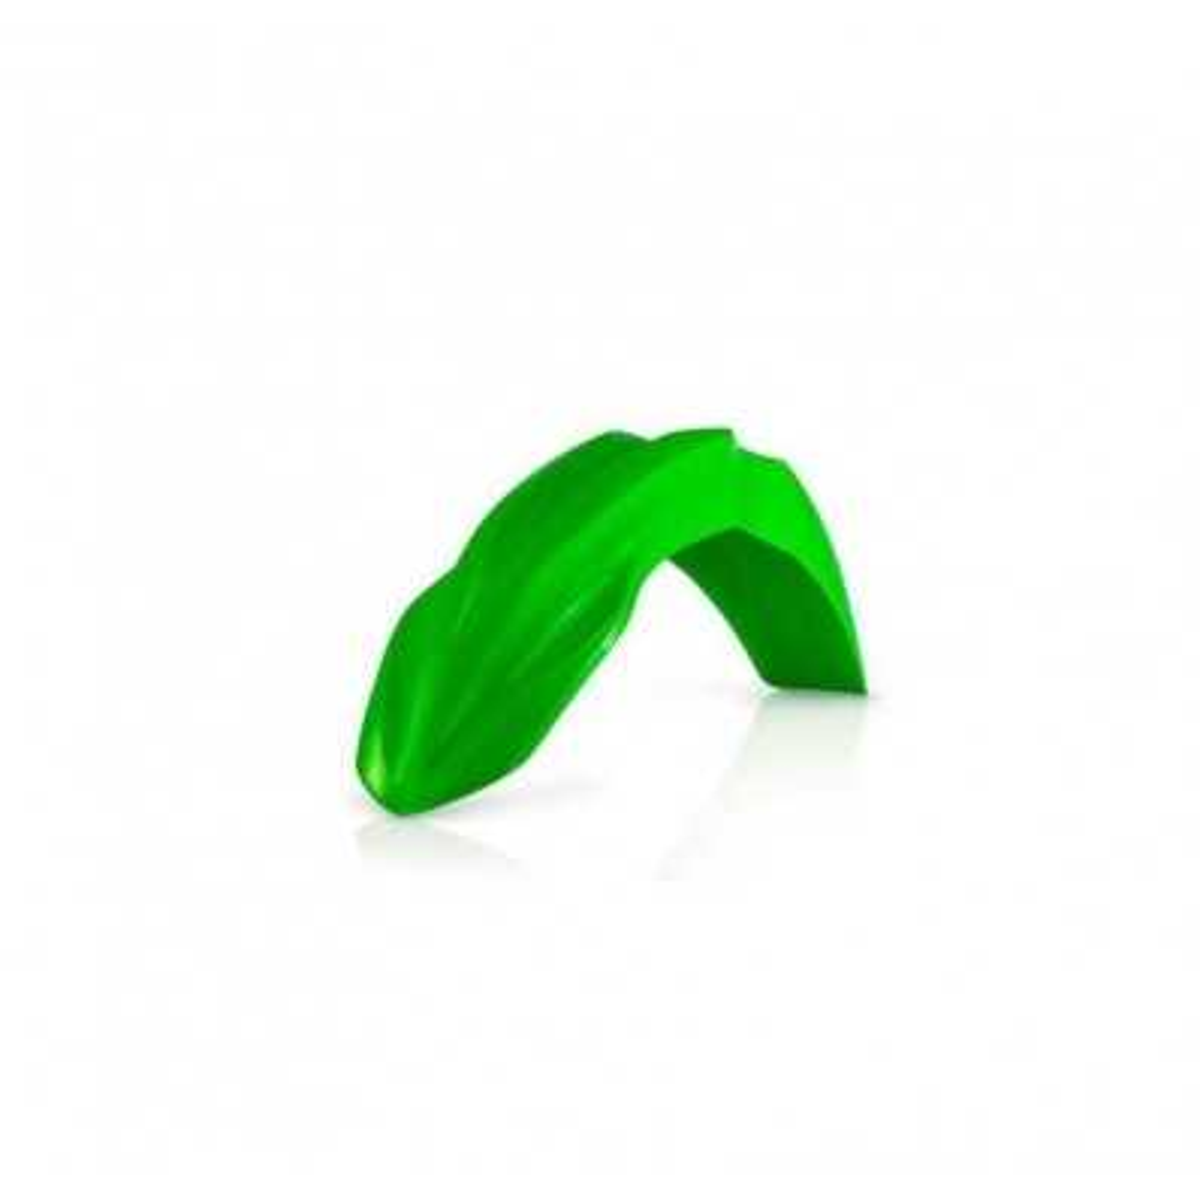 0016880-130 - Guardabarros Delantero Kx-F 250 13 16 Verde